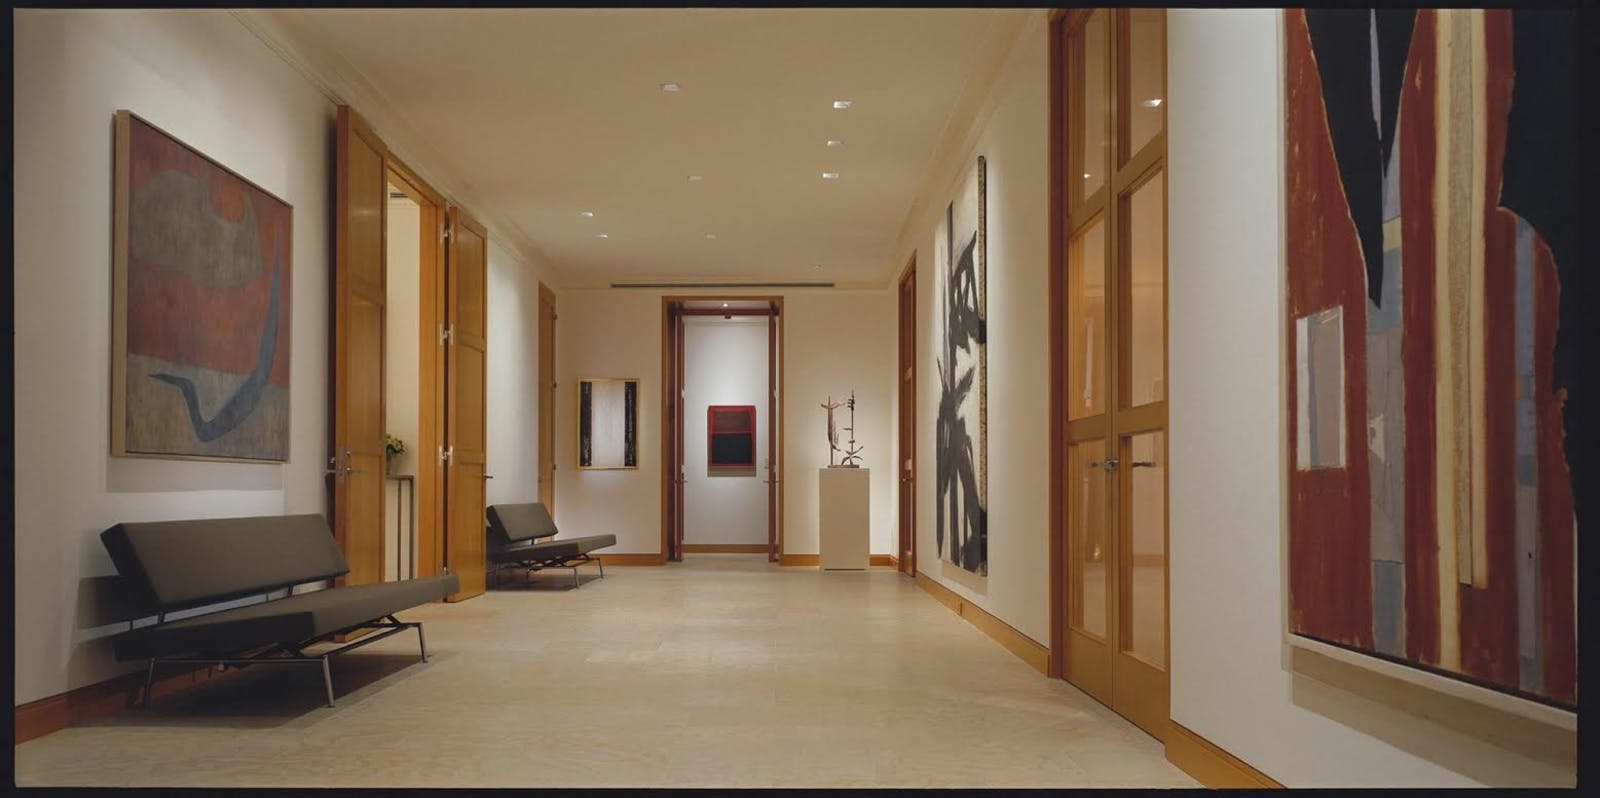 Gallery. © Gomez Associates